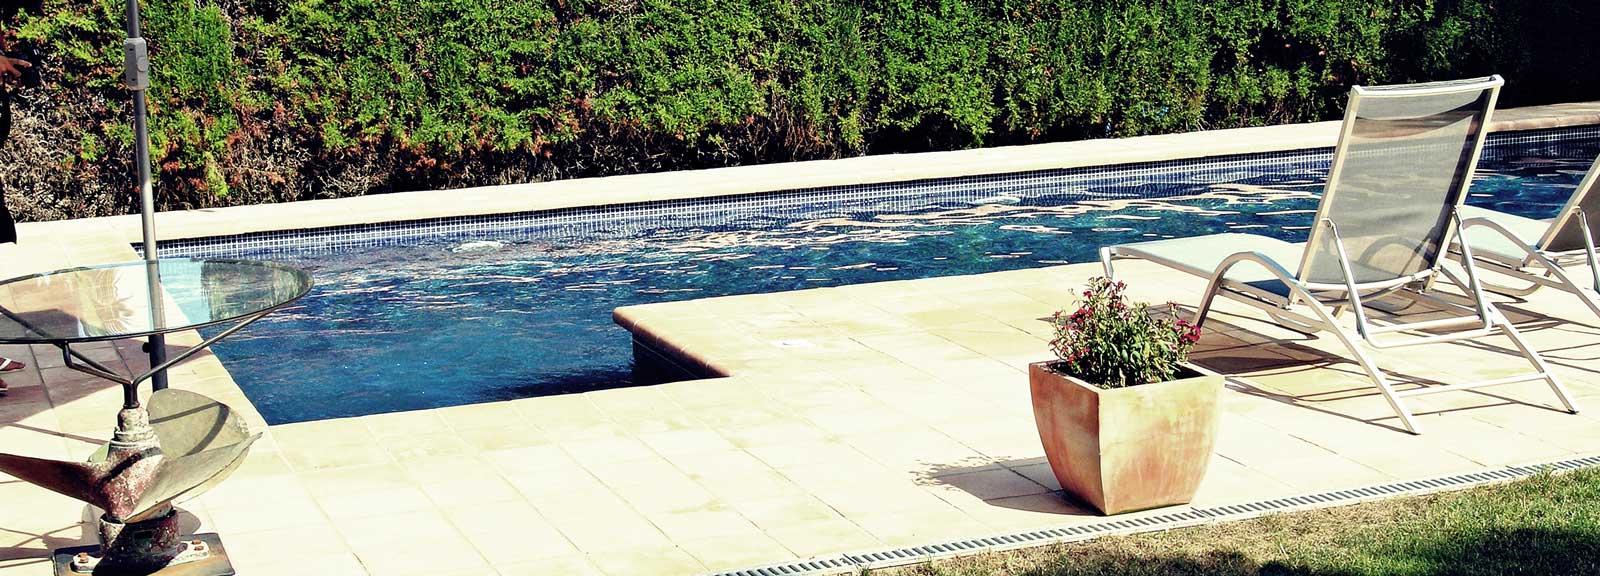 aguaviva-piscinas-sli-05